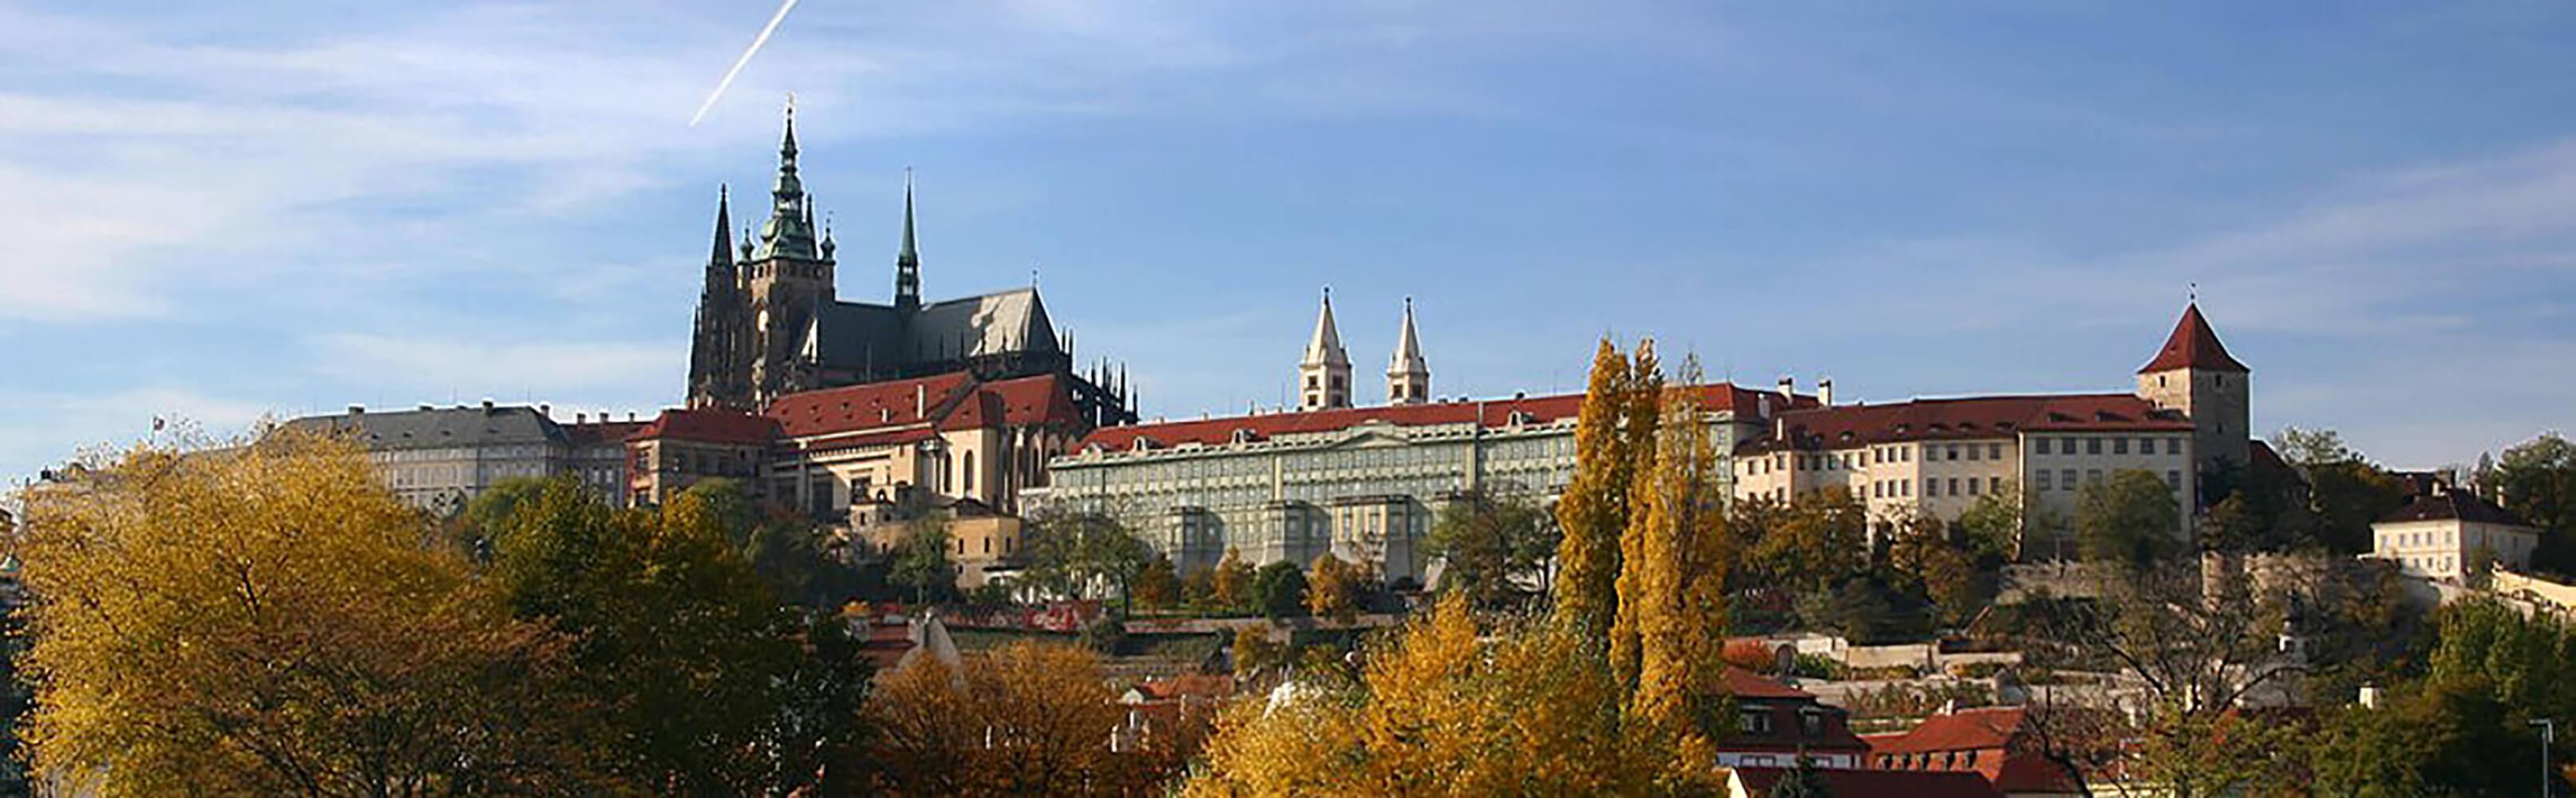 Prager Burg 1